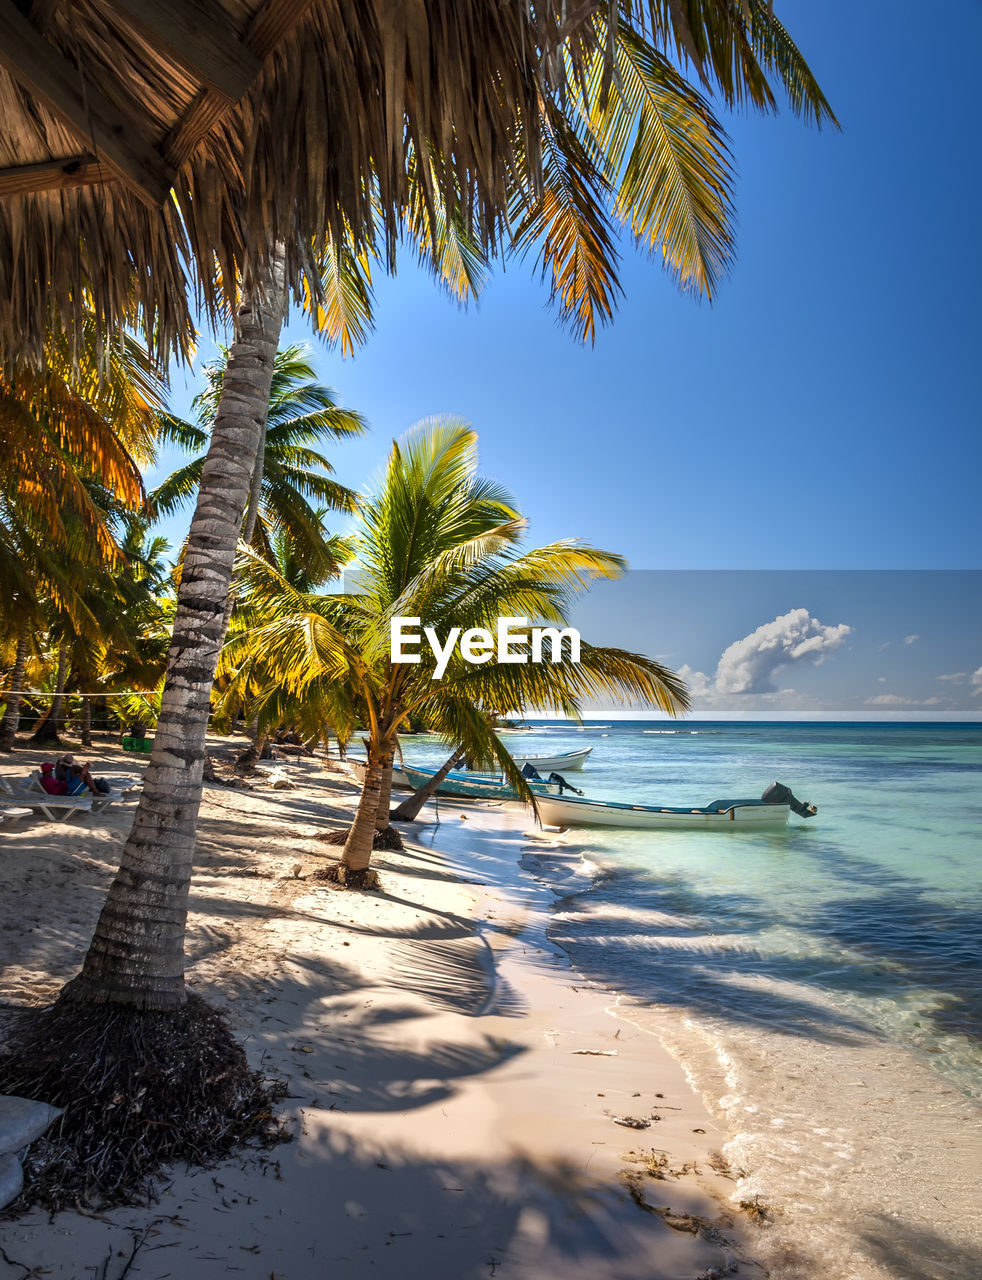 PALM TREES ON BEACH AGAINST SEA